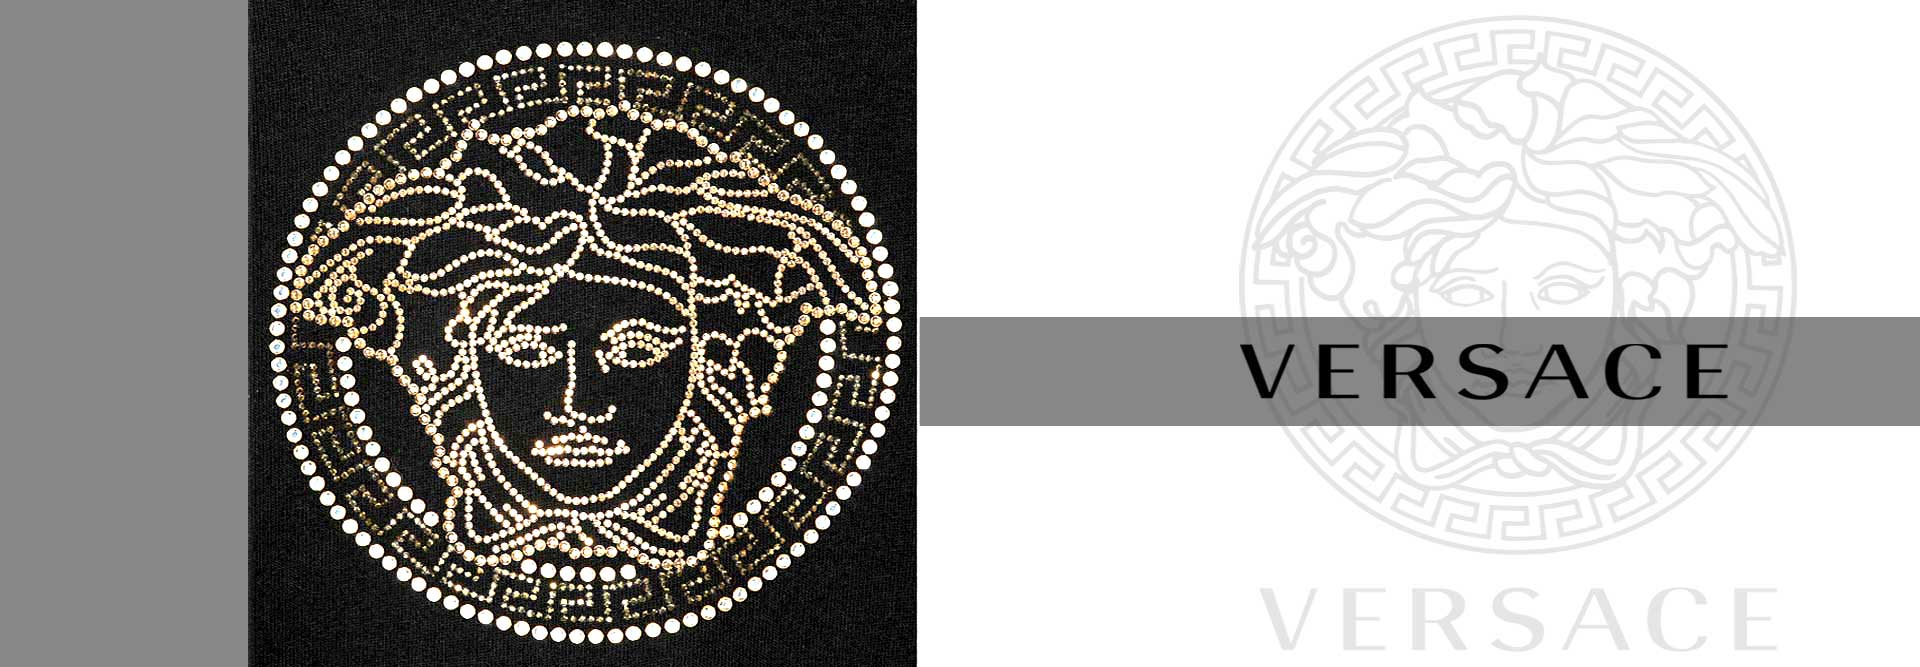 versace sh9 1 - جیانیورساچه versace